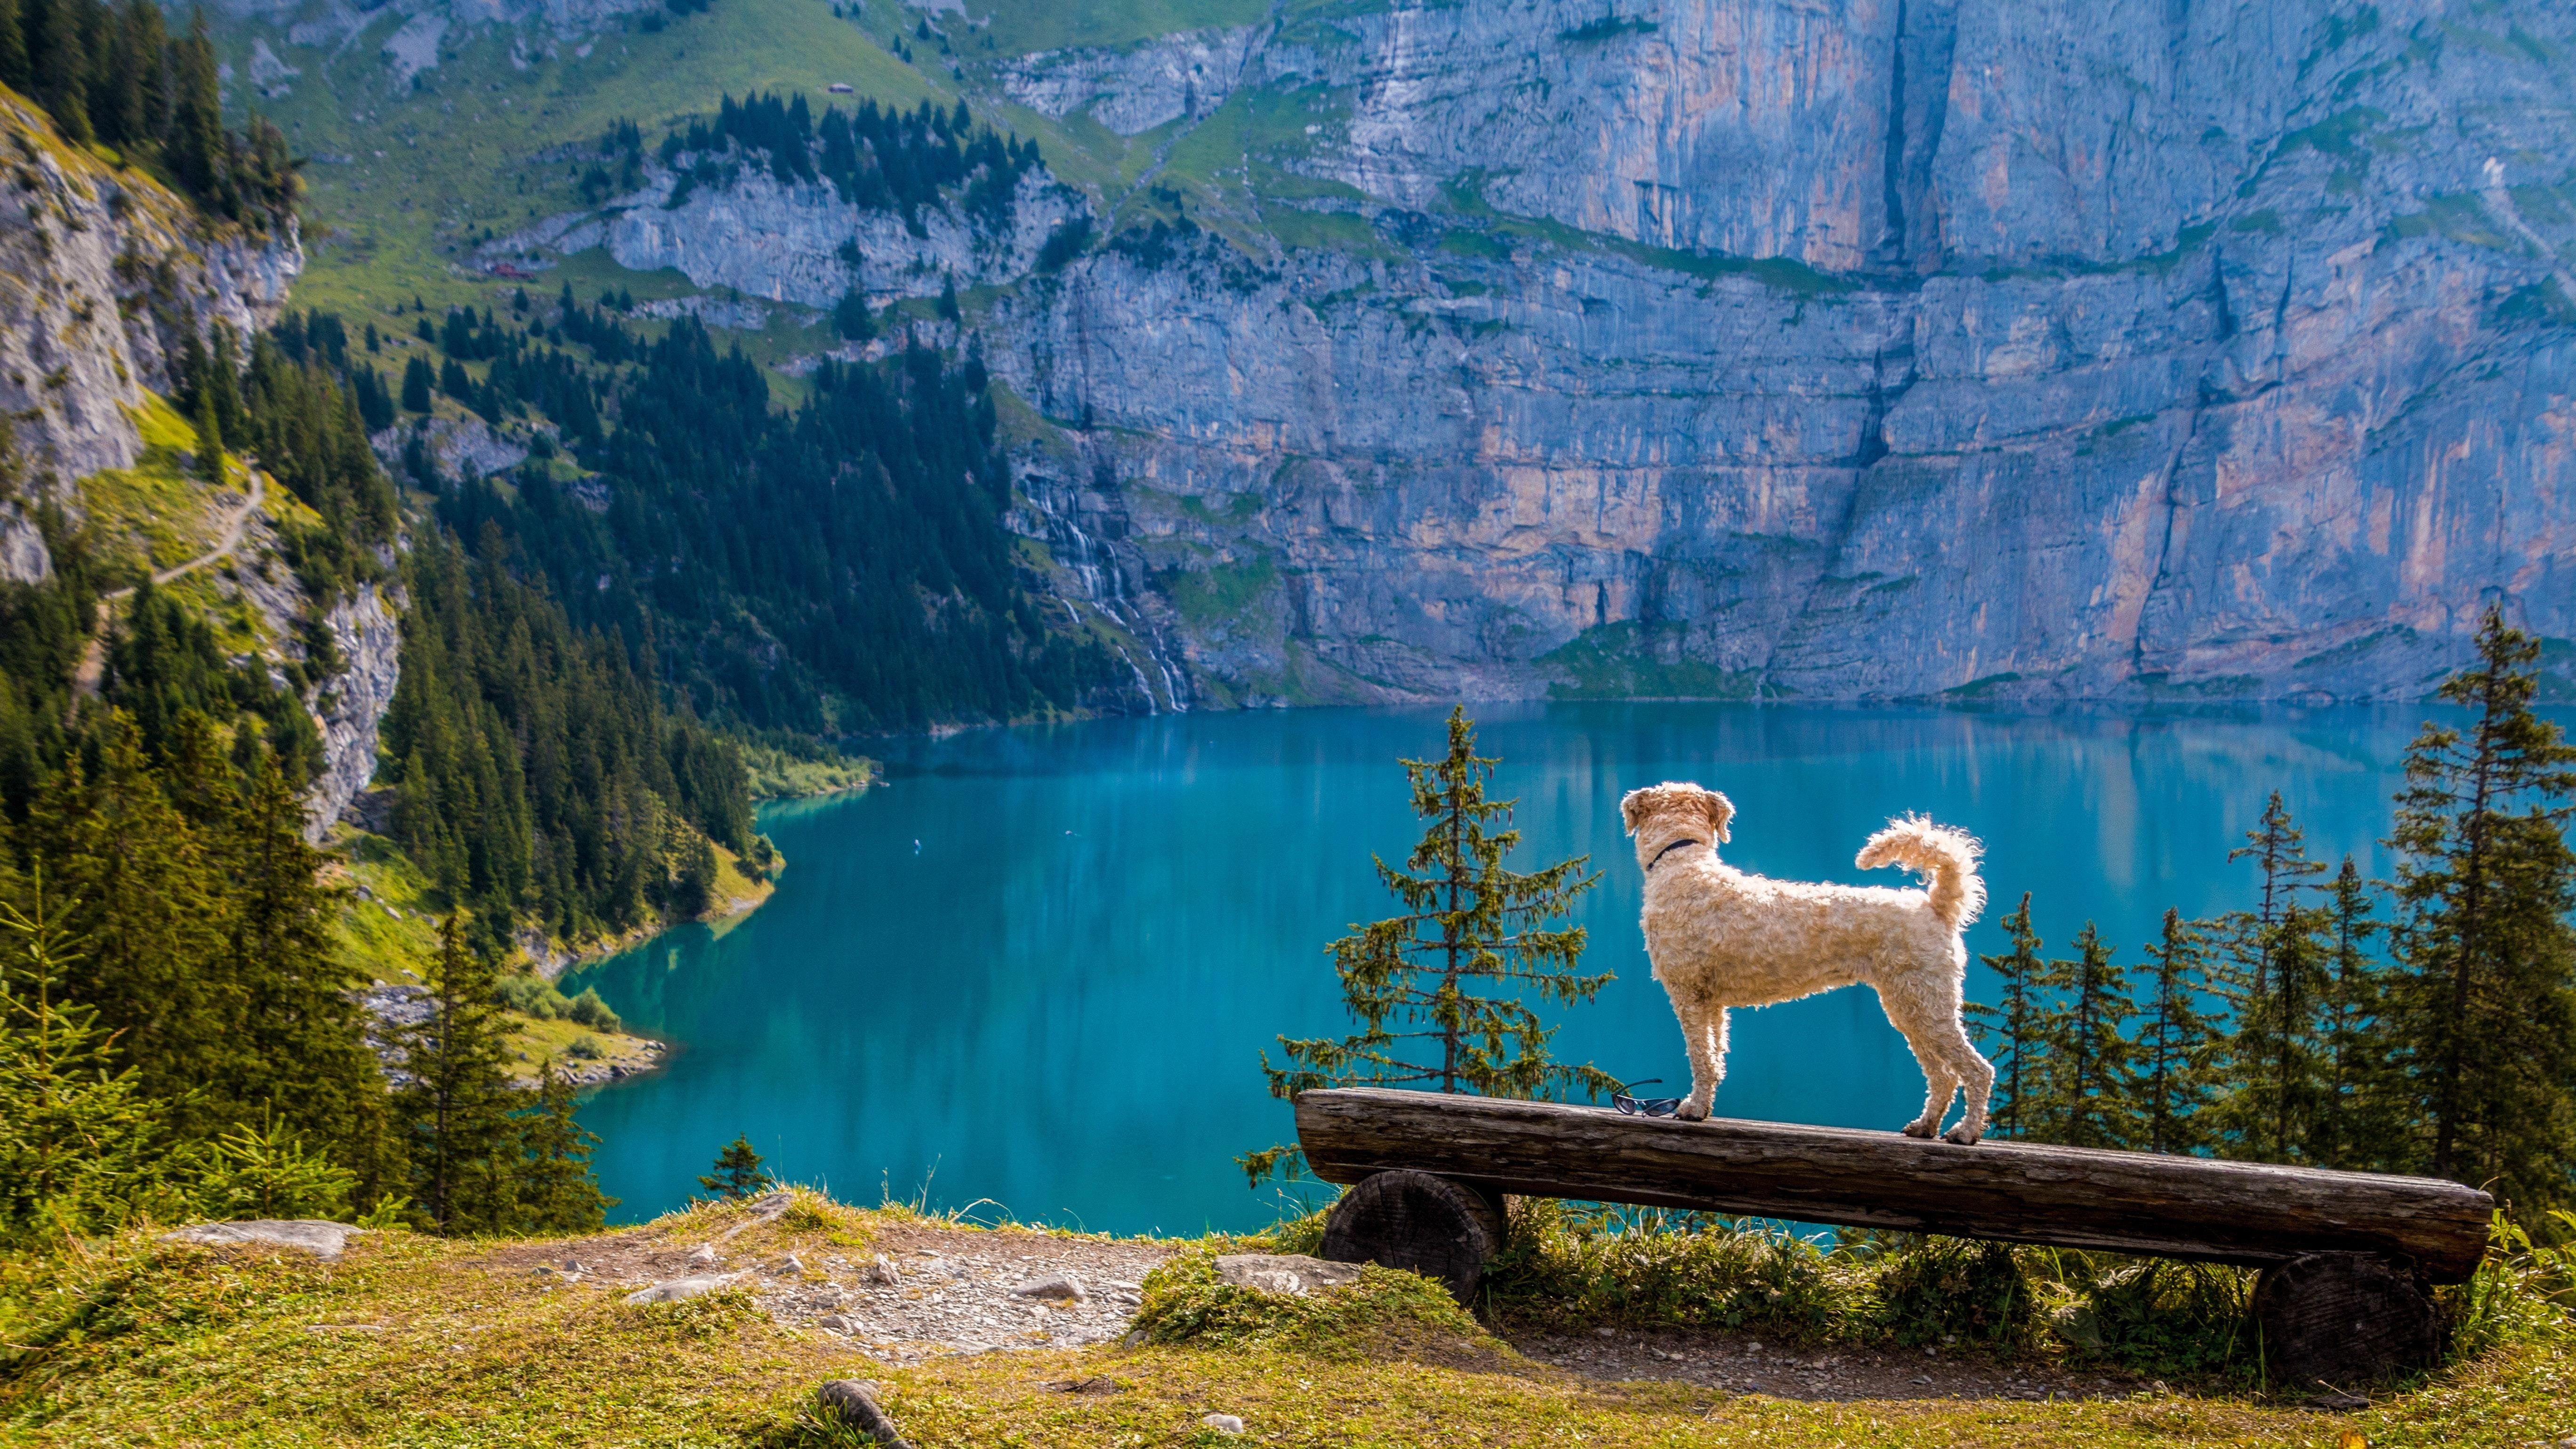 swan-on-lake-against-mountain-247522